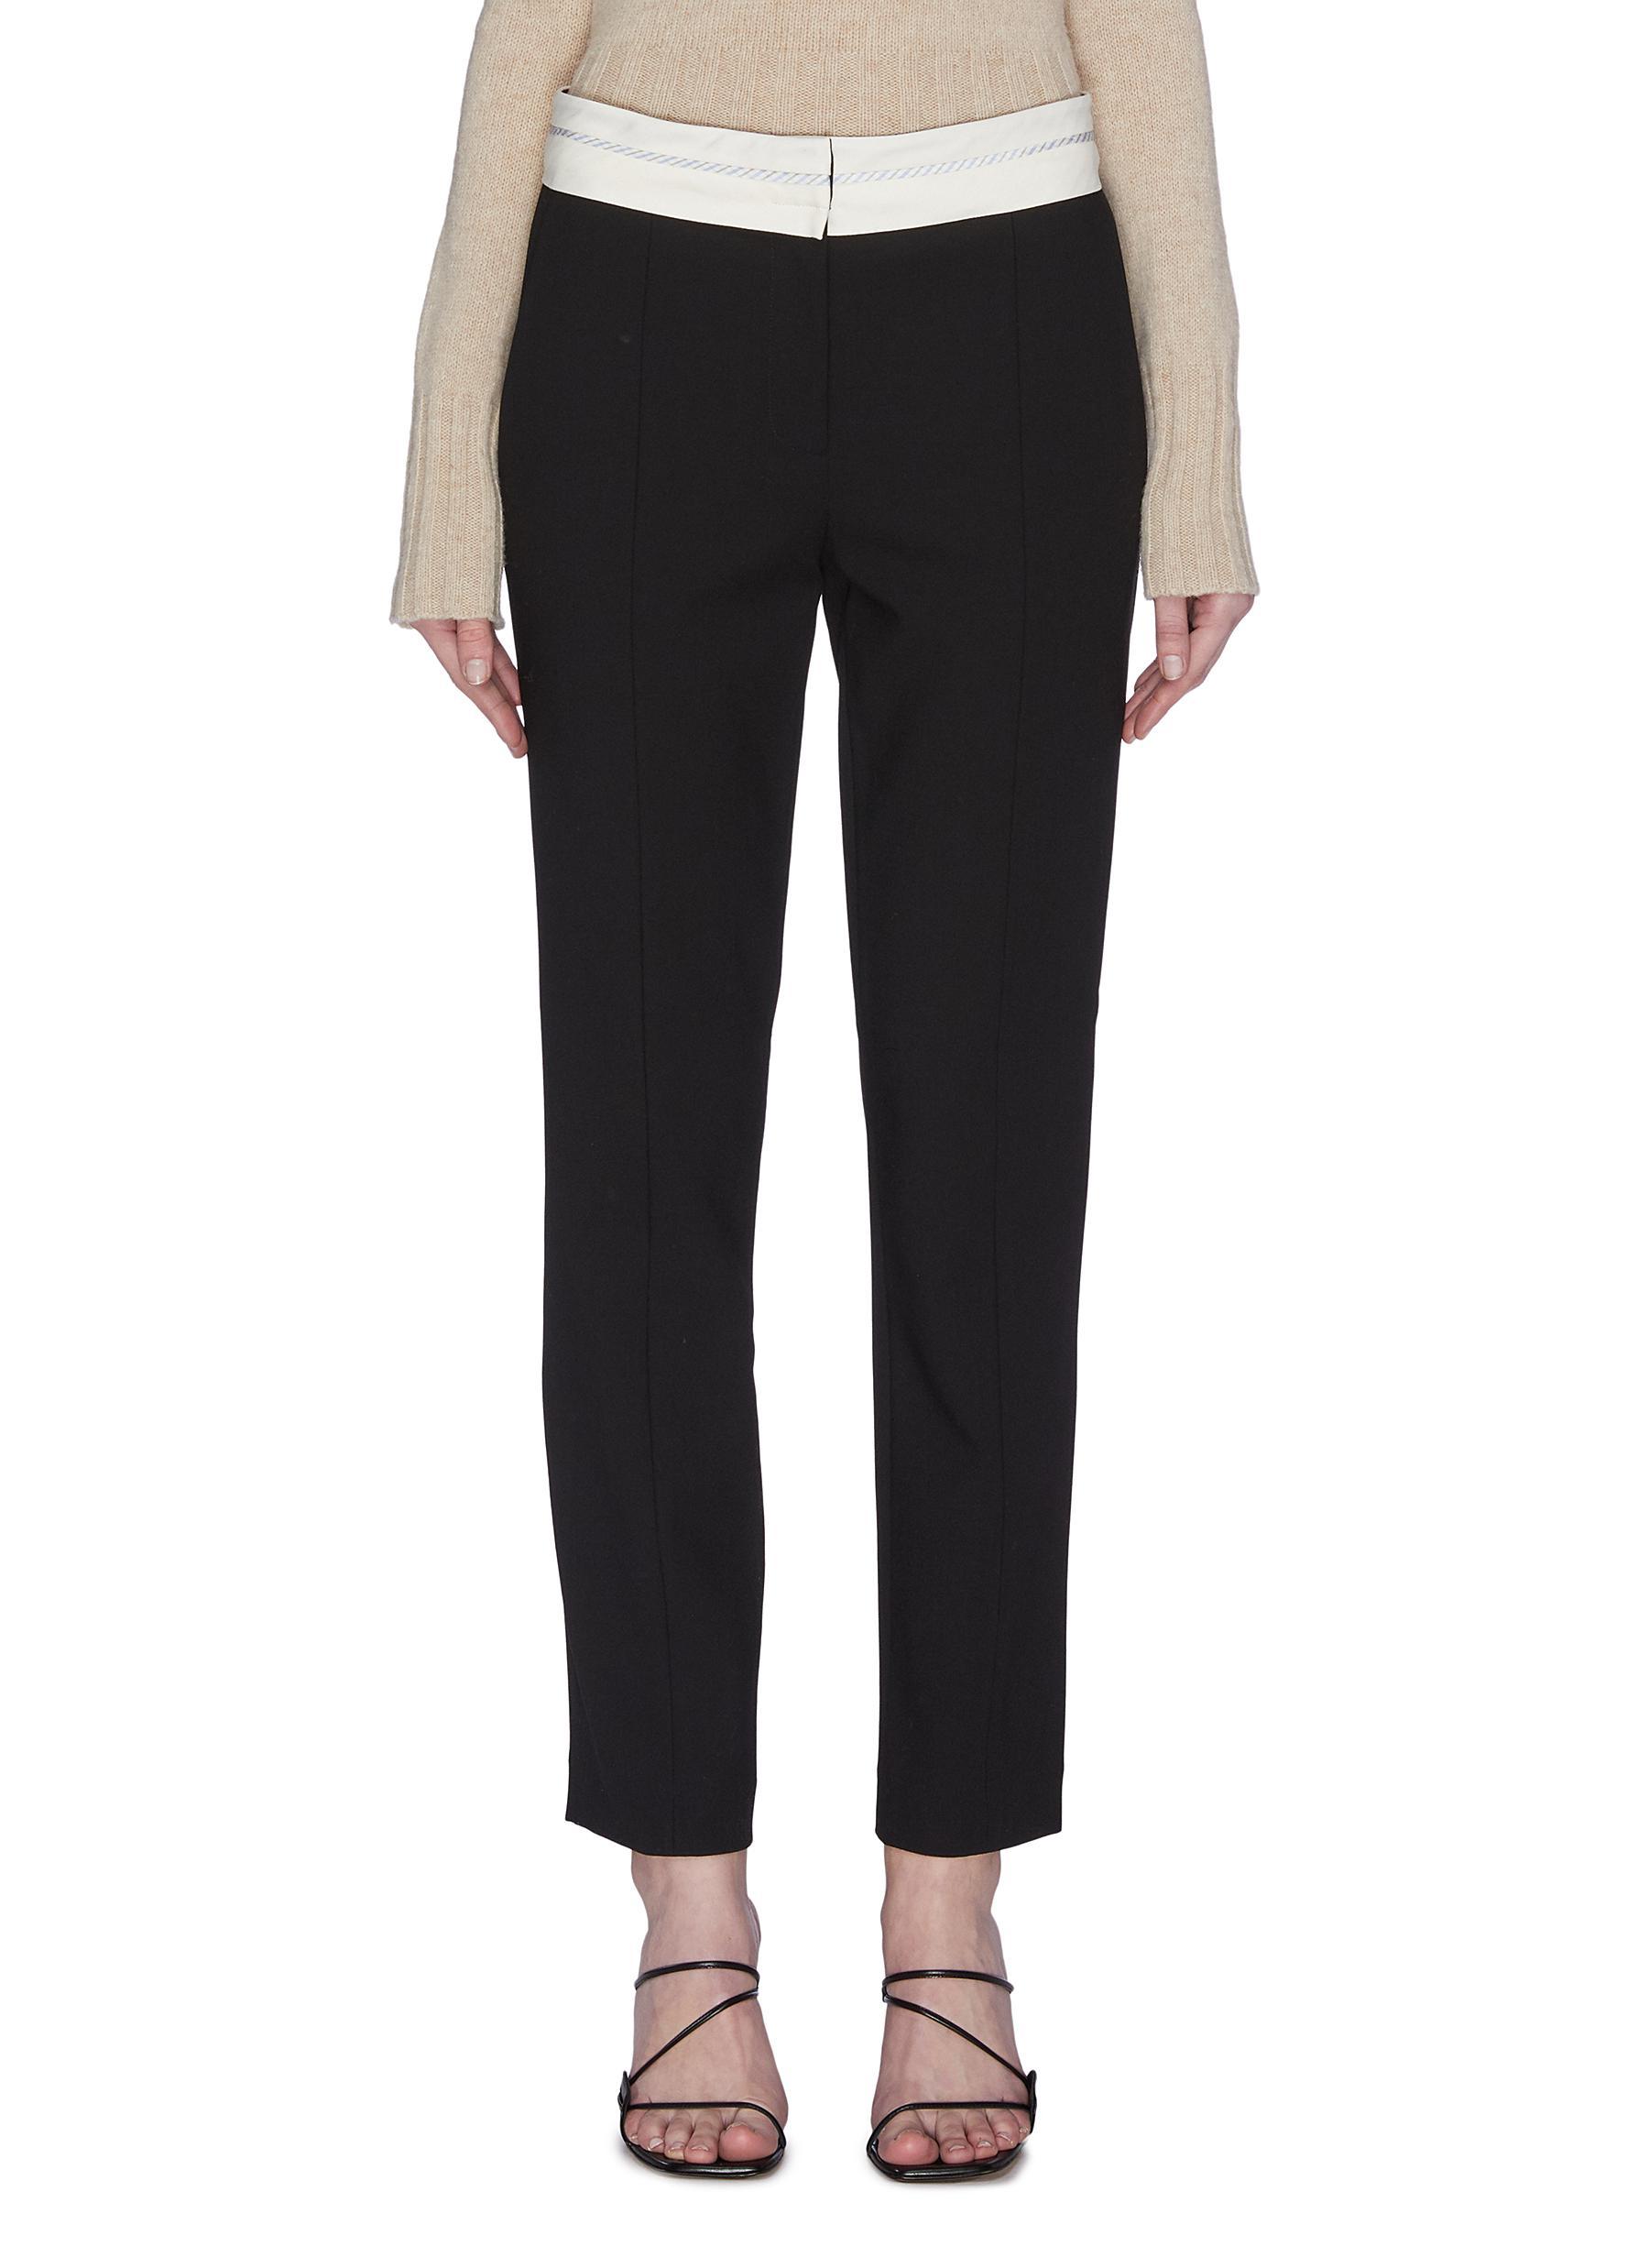 Buy Tibi Pants & Shorts 'Beatle' contrast waistband slit hem pants